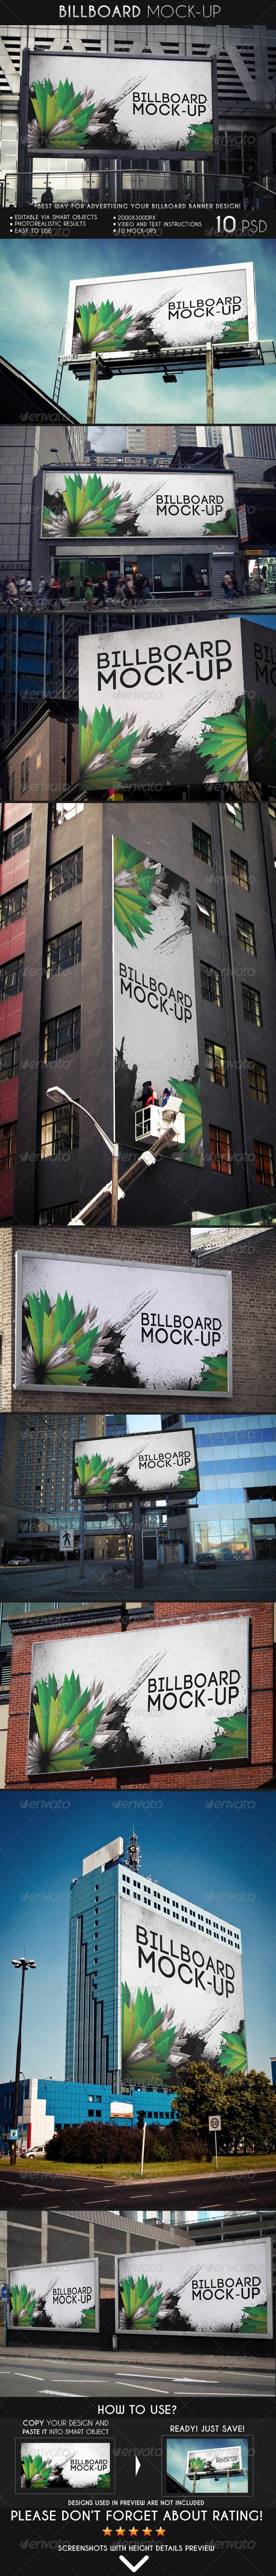 GraphicRiver Billboard Mock-Up 6993838